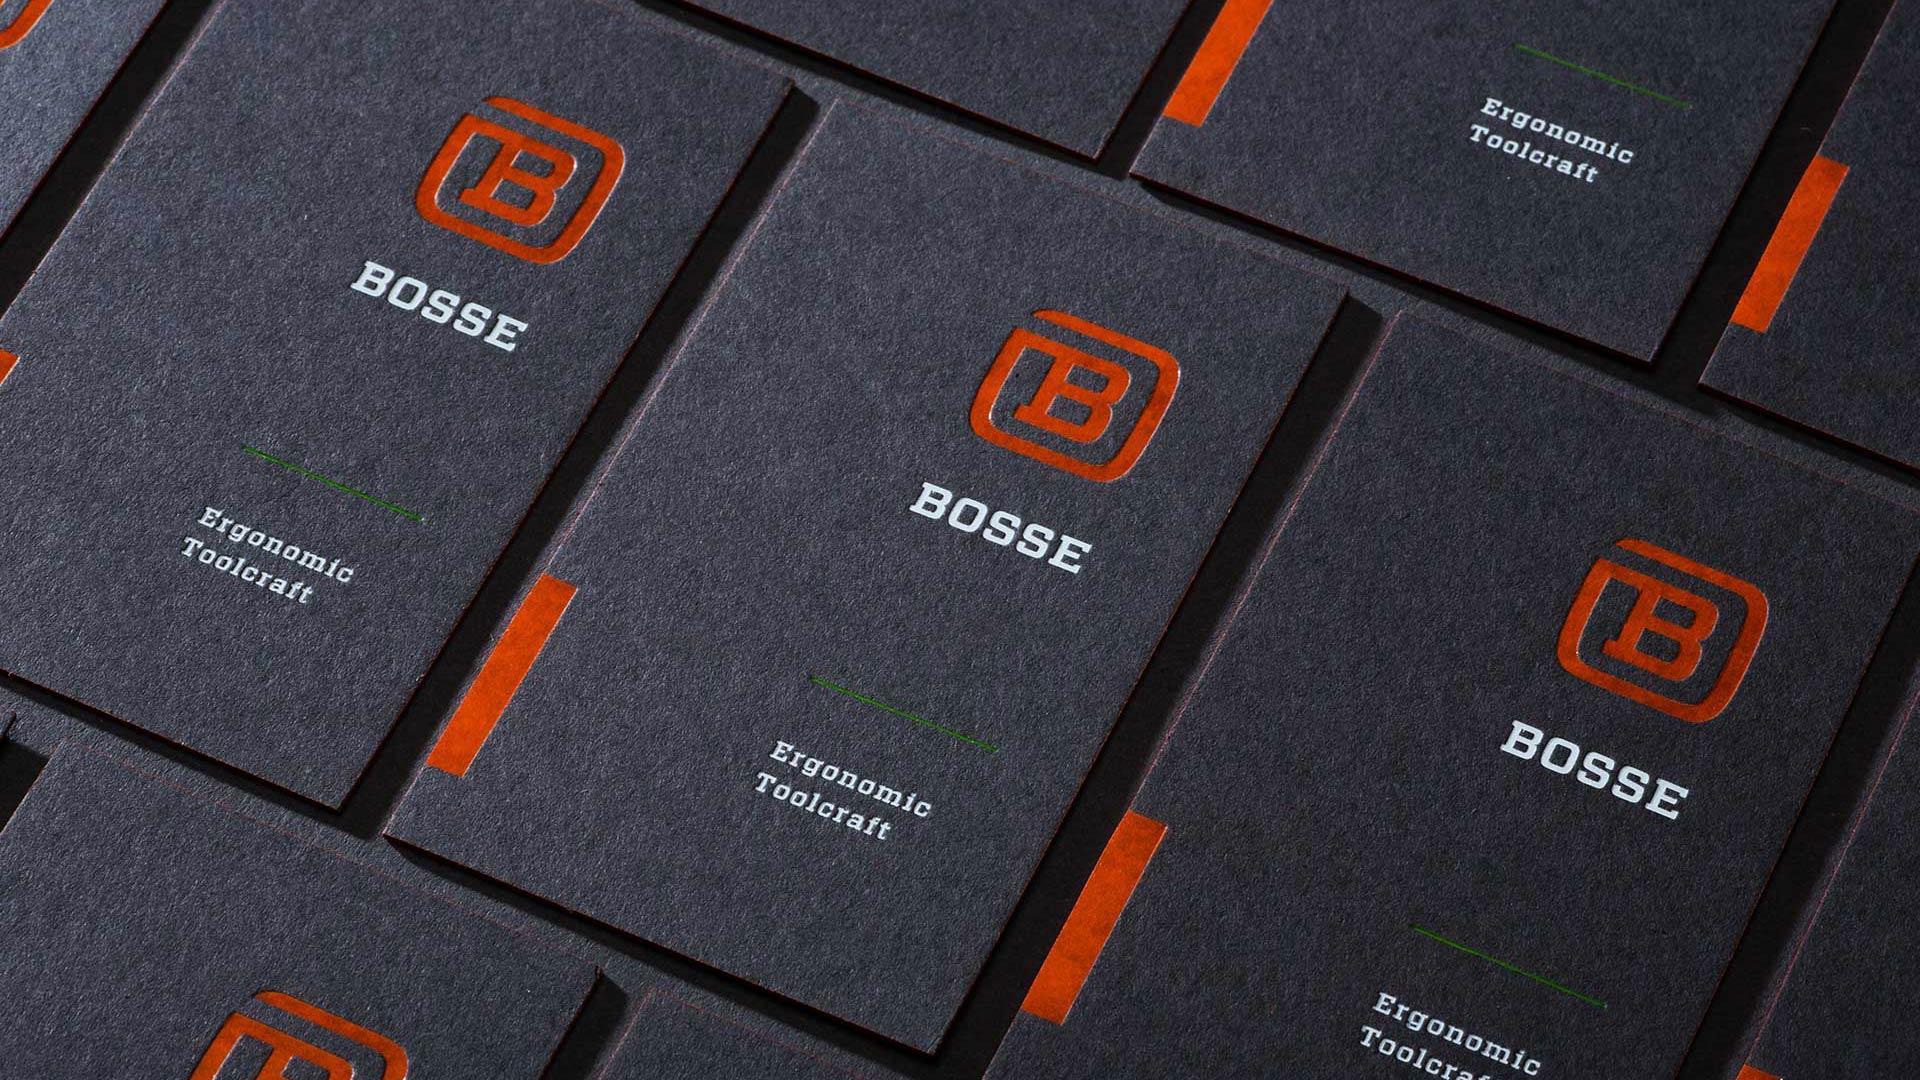 Bosse-Cards